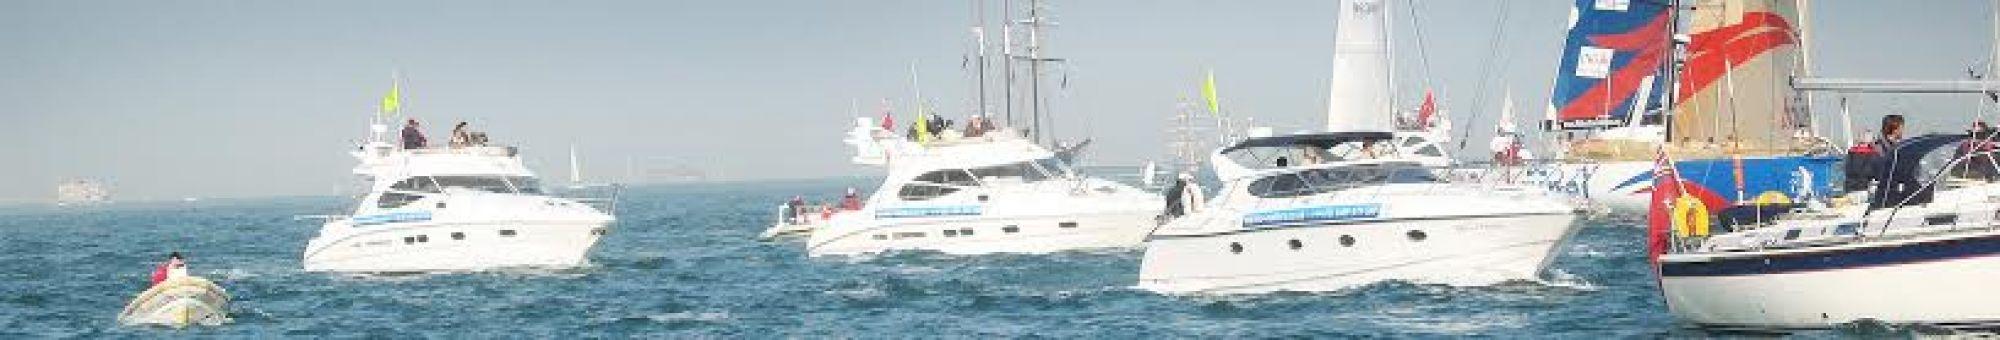 Fleet of Marine Matters charter vessels